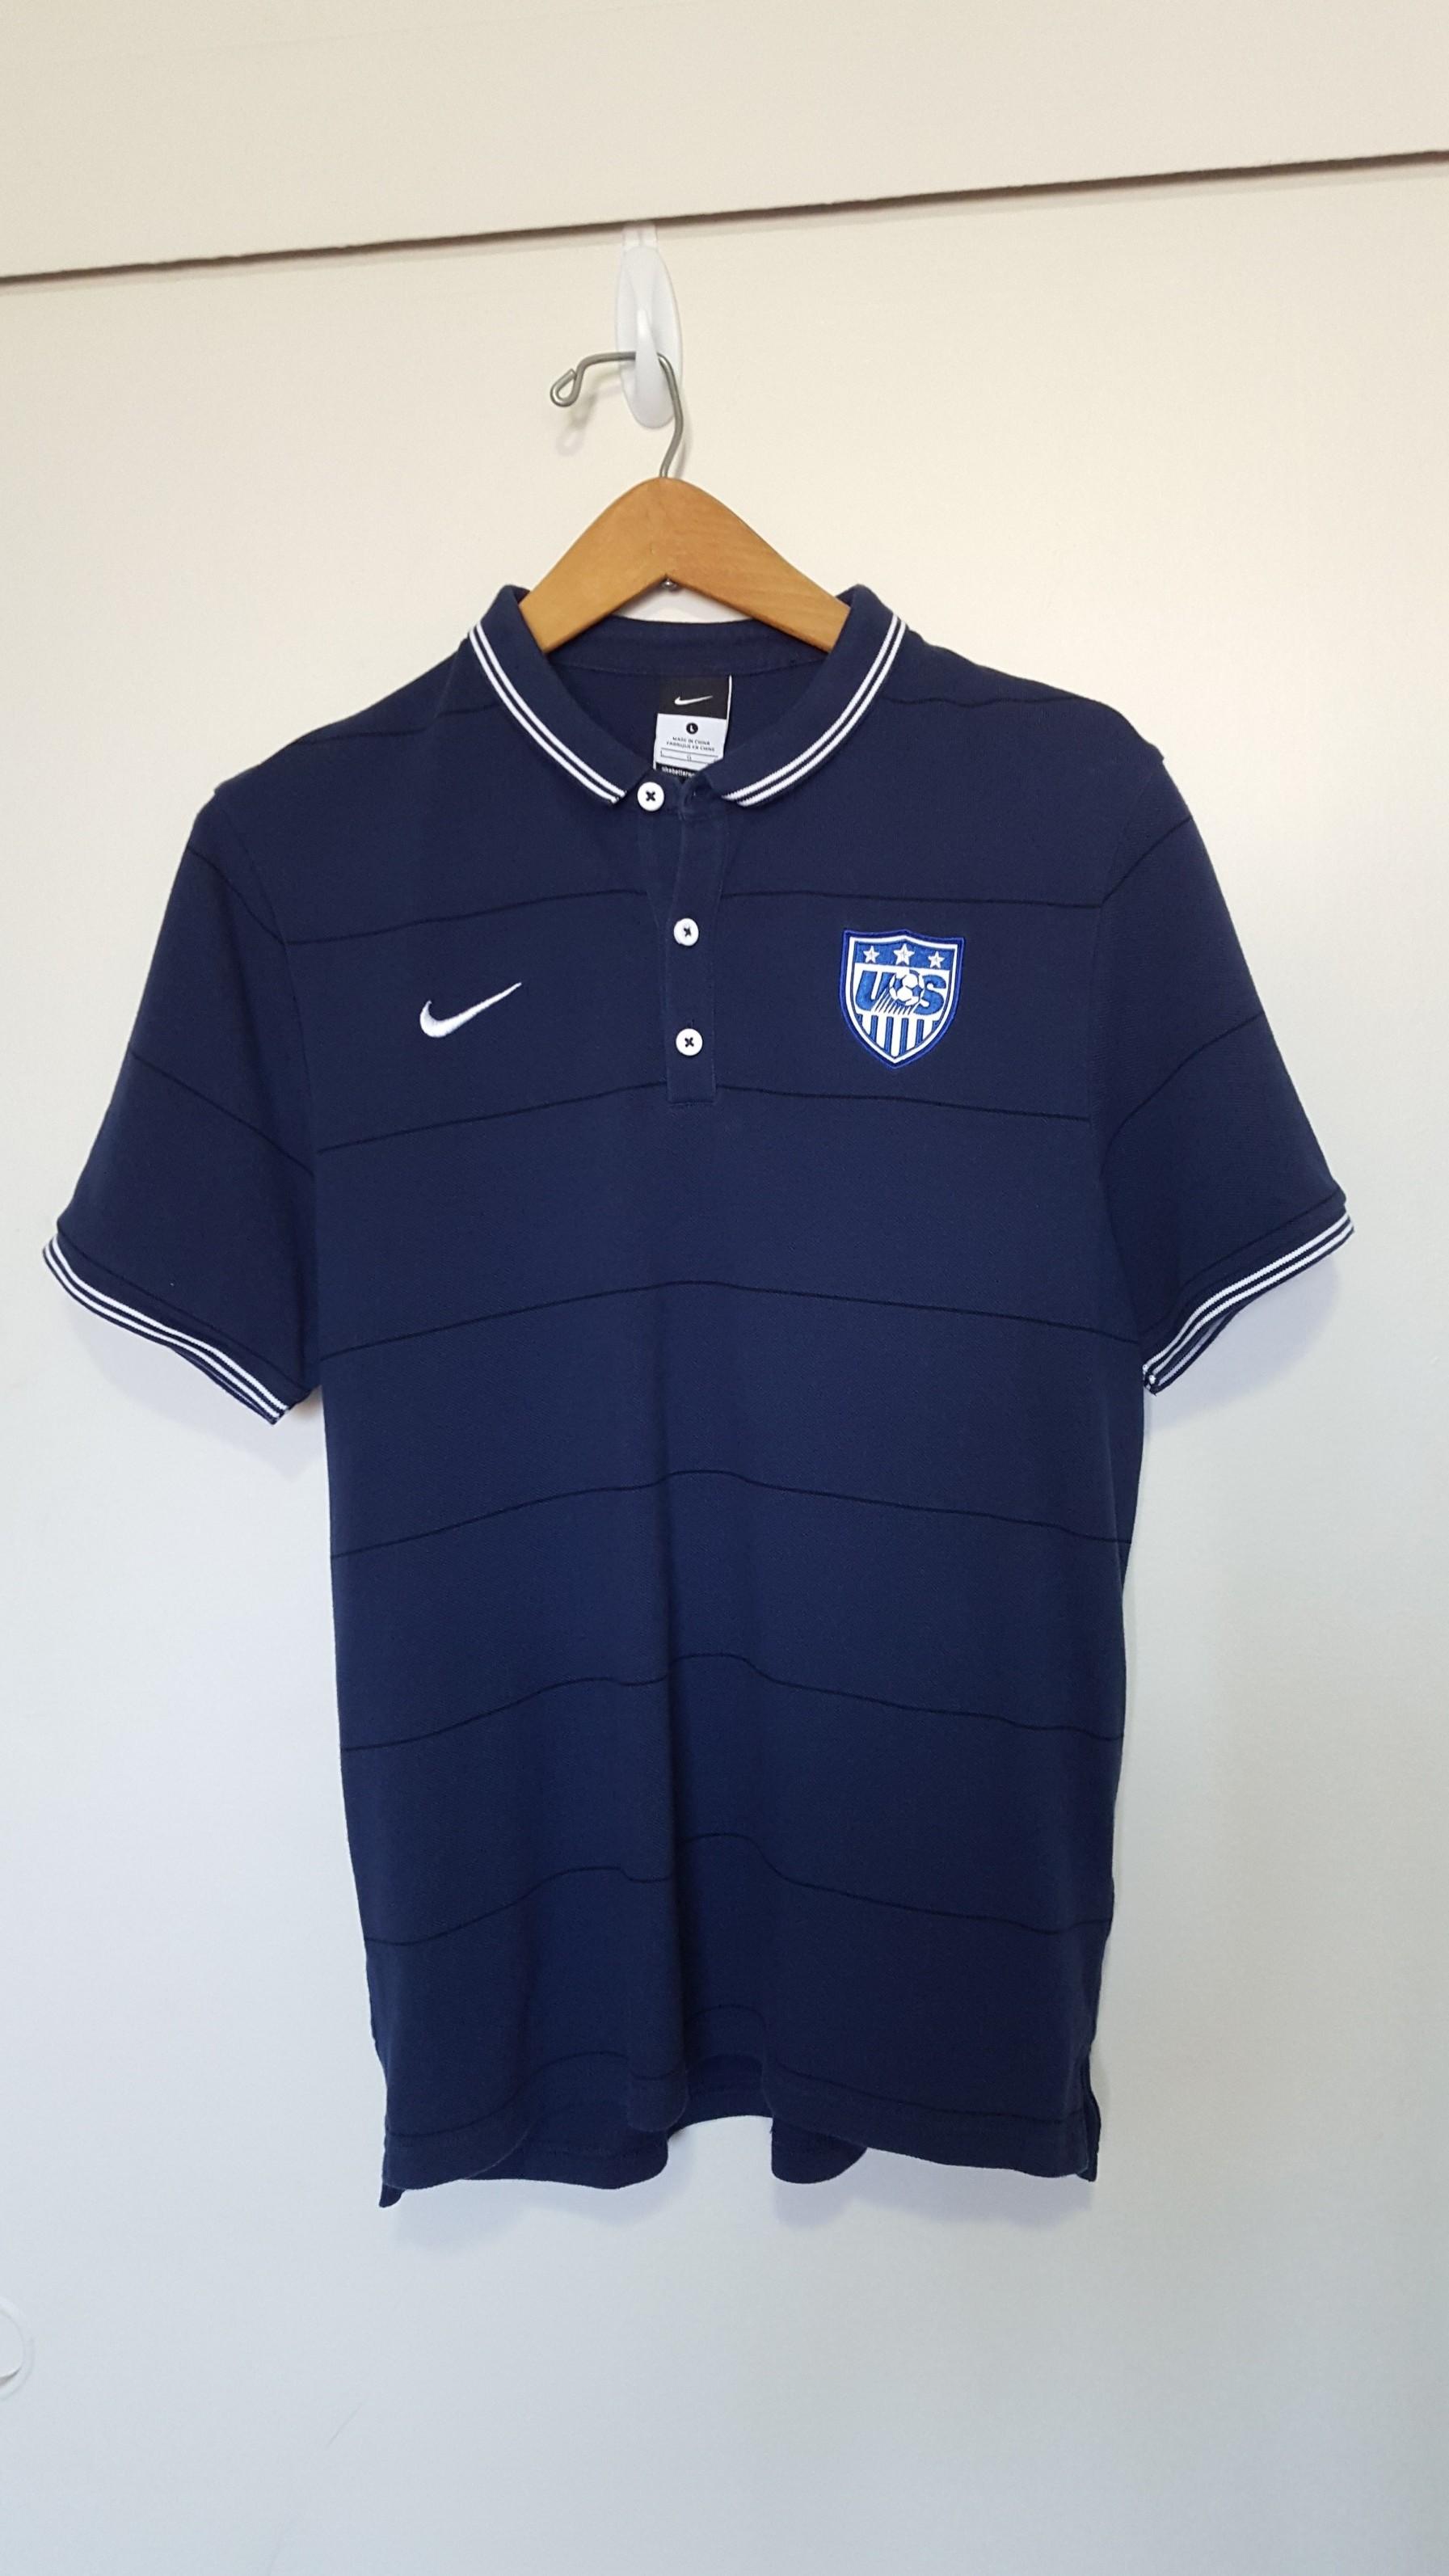 96daab33e28 Us Mens Soccer Team T Shirt - Nils Stucki Kieferorthopäde